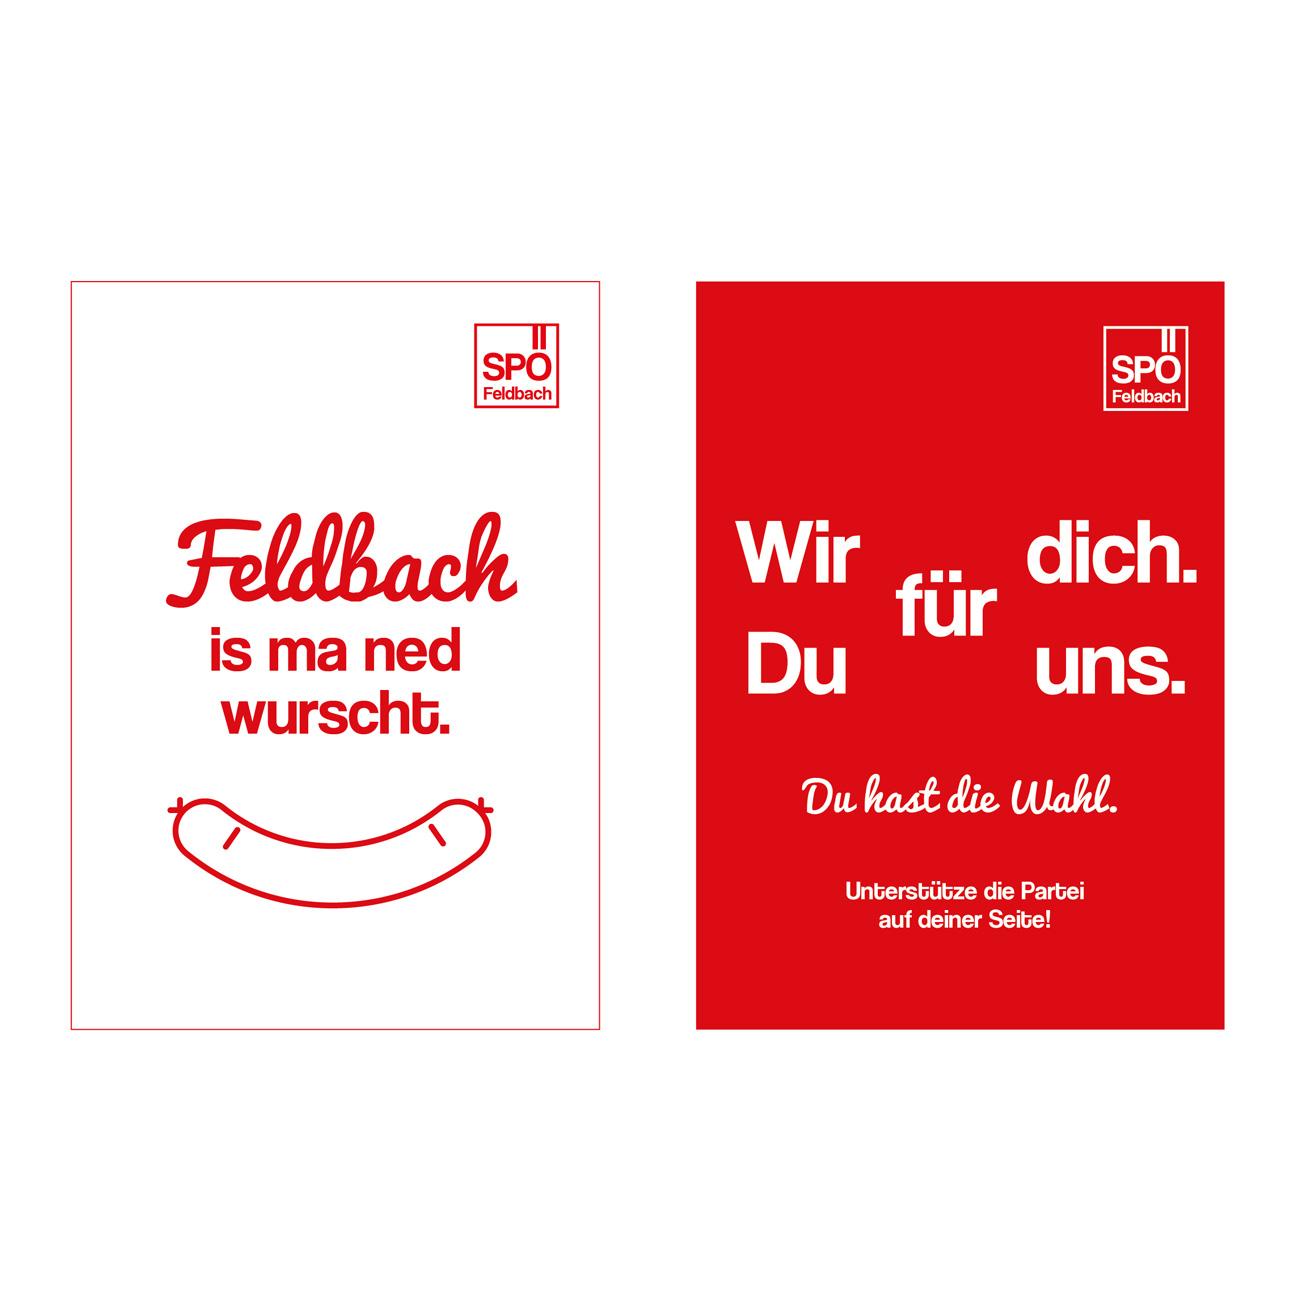 SPÖ Plakate